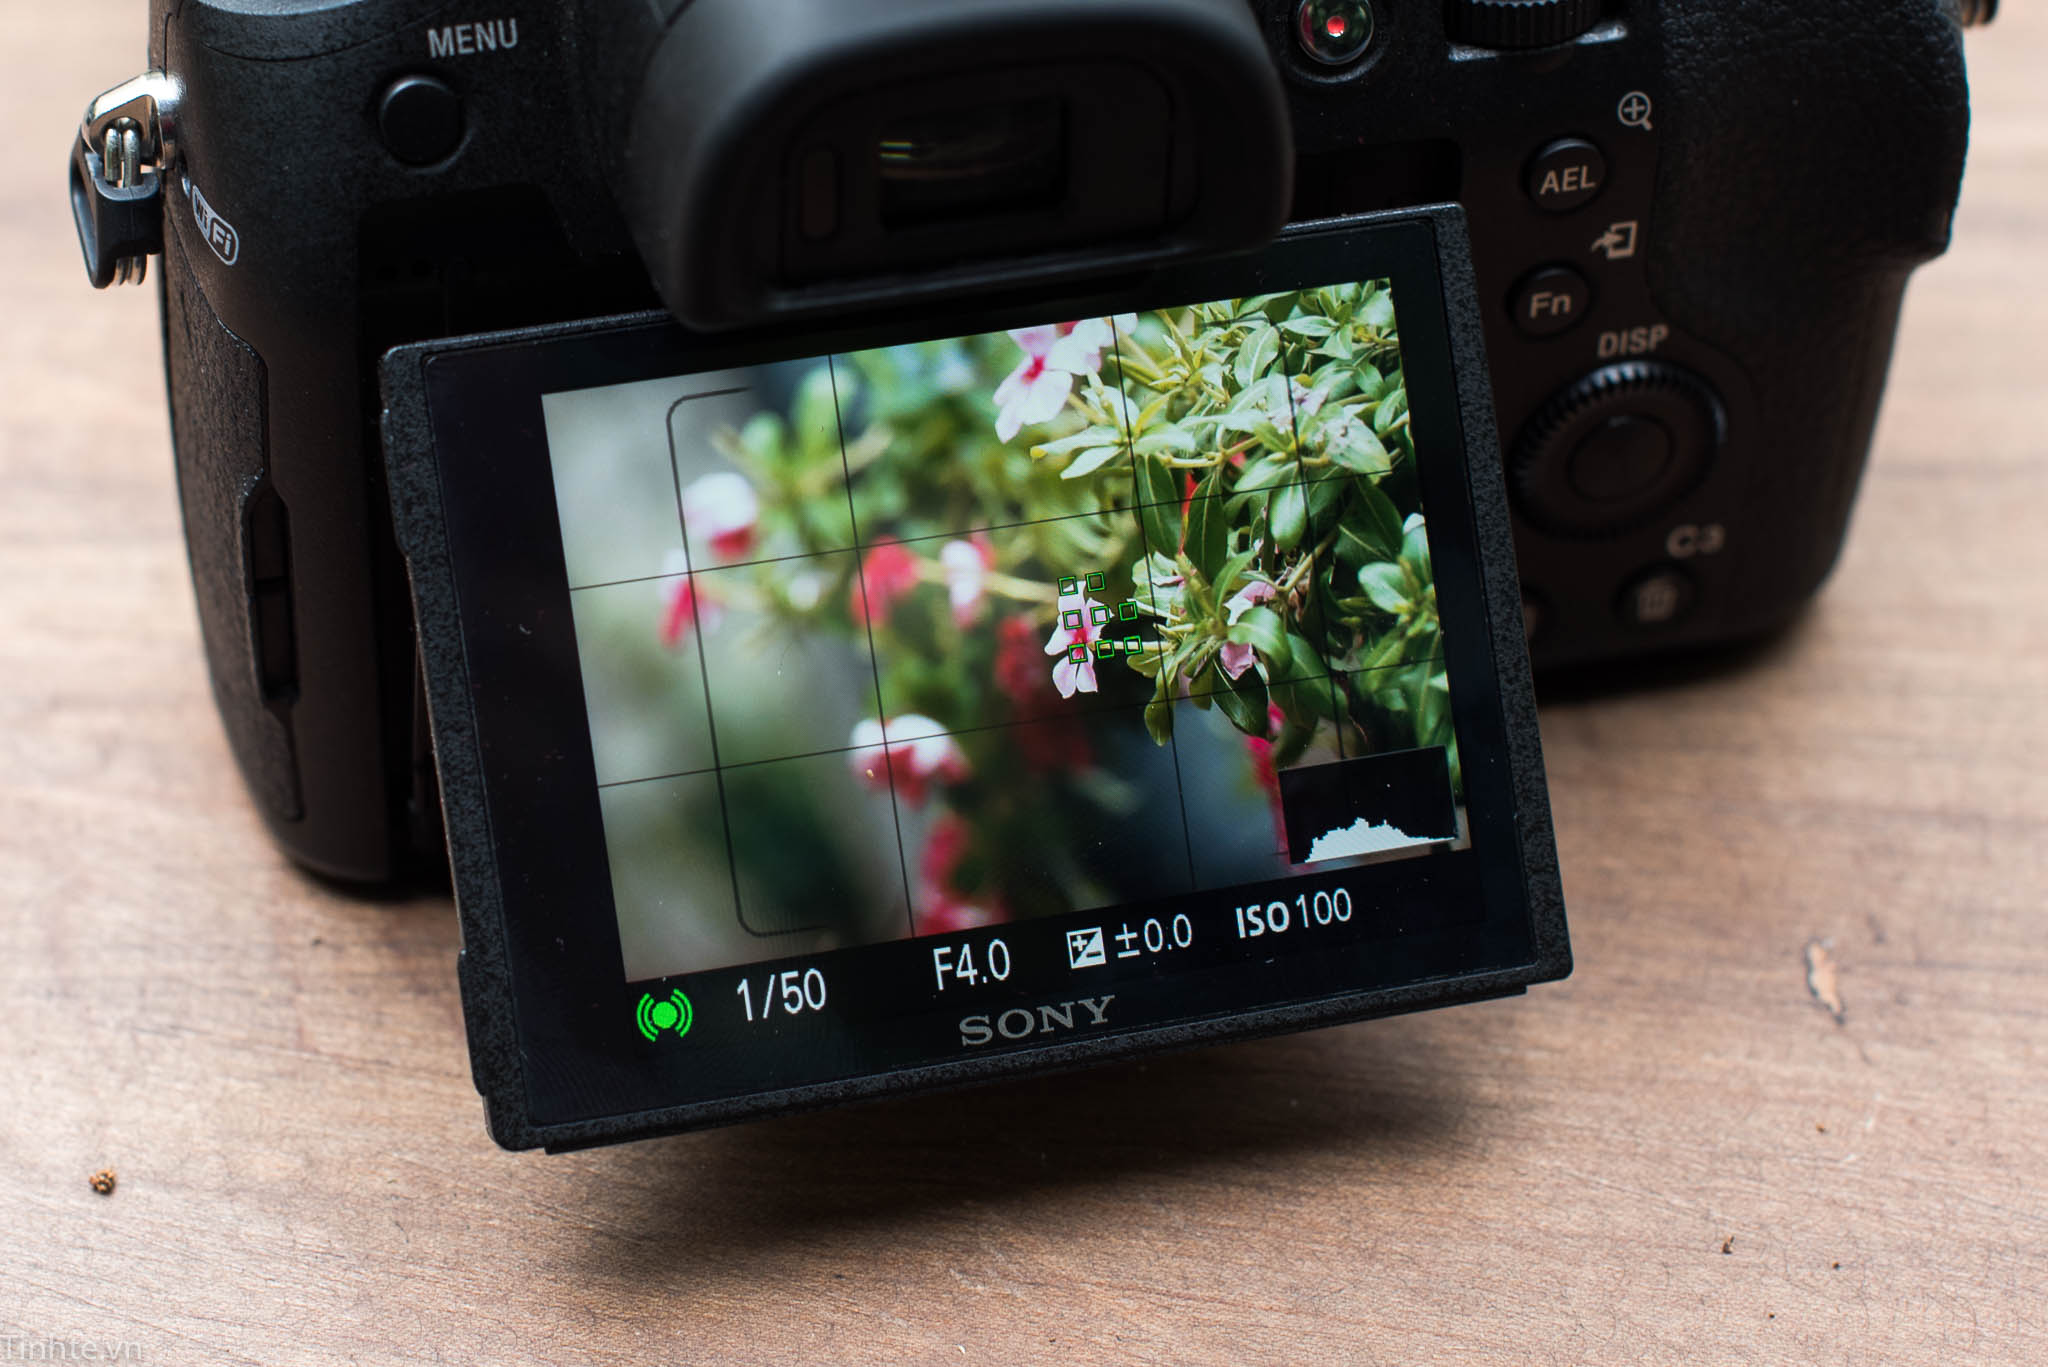 So sanh Sony RX10 mark IV vs Mark III - Camera.tinhte.vn -4.jpg